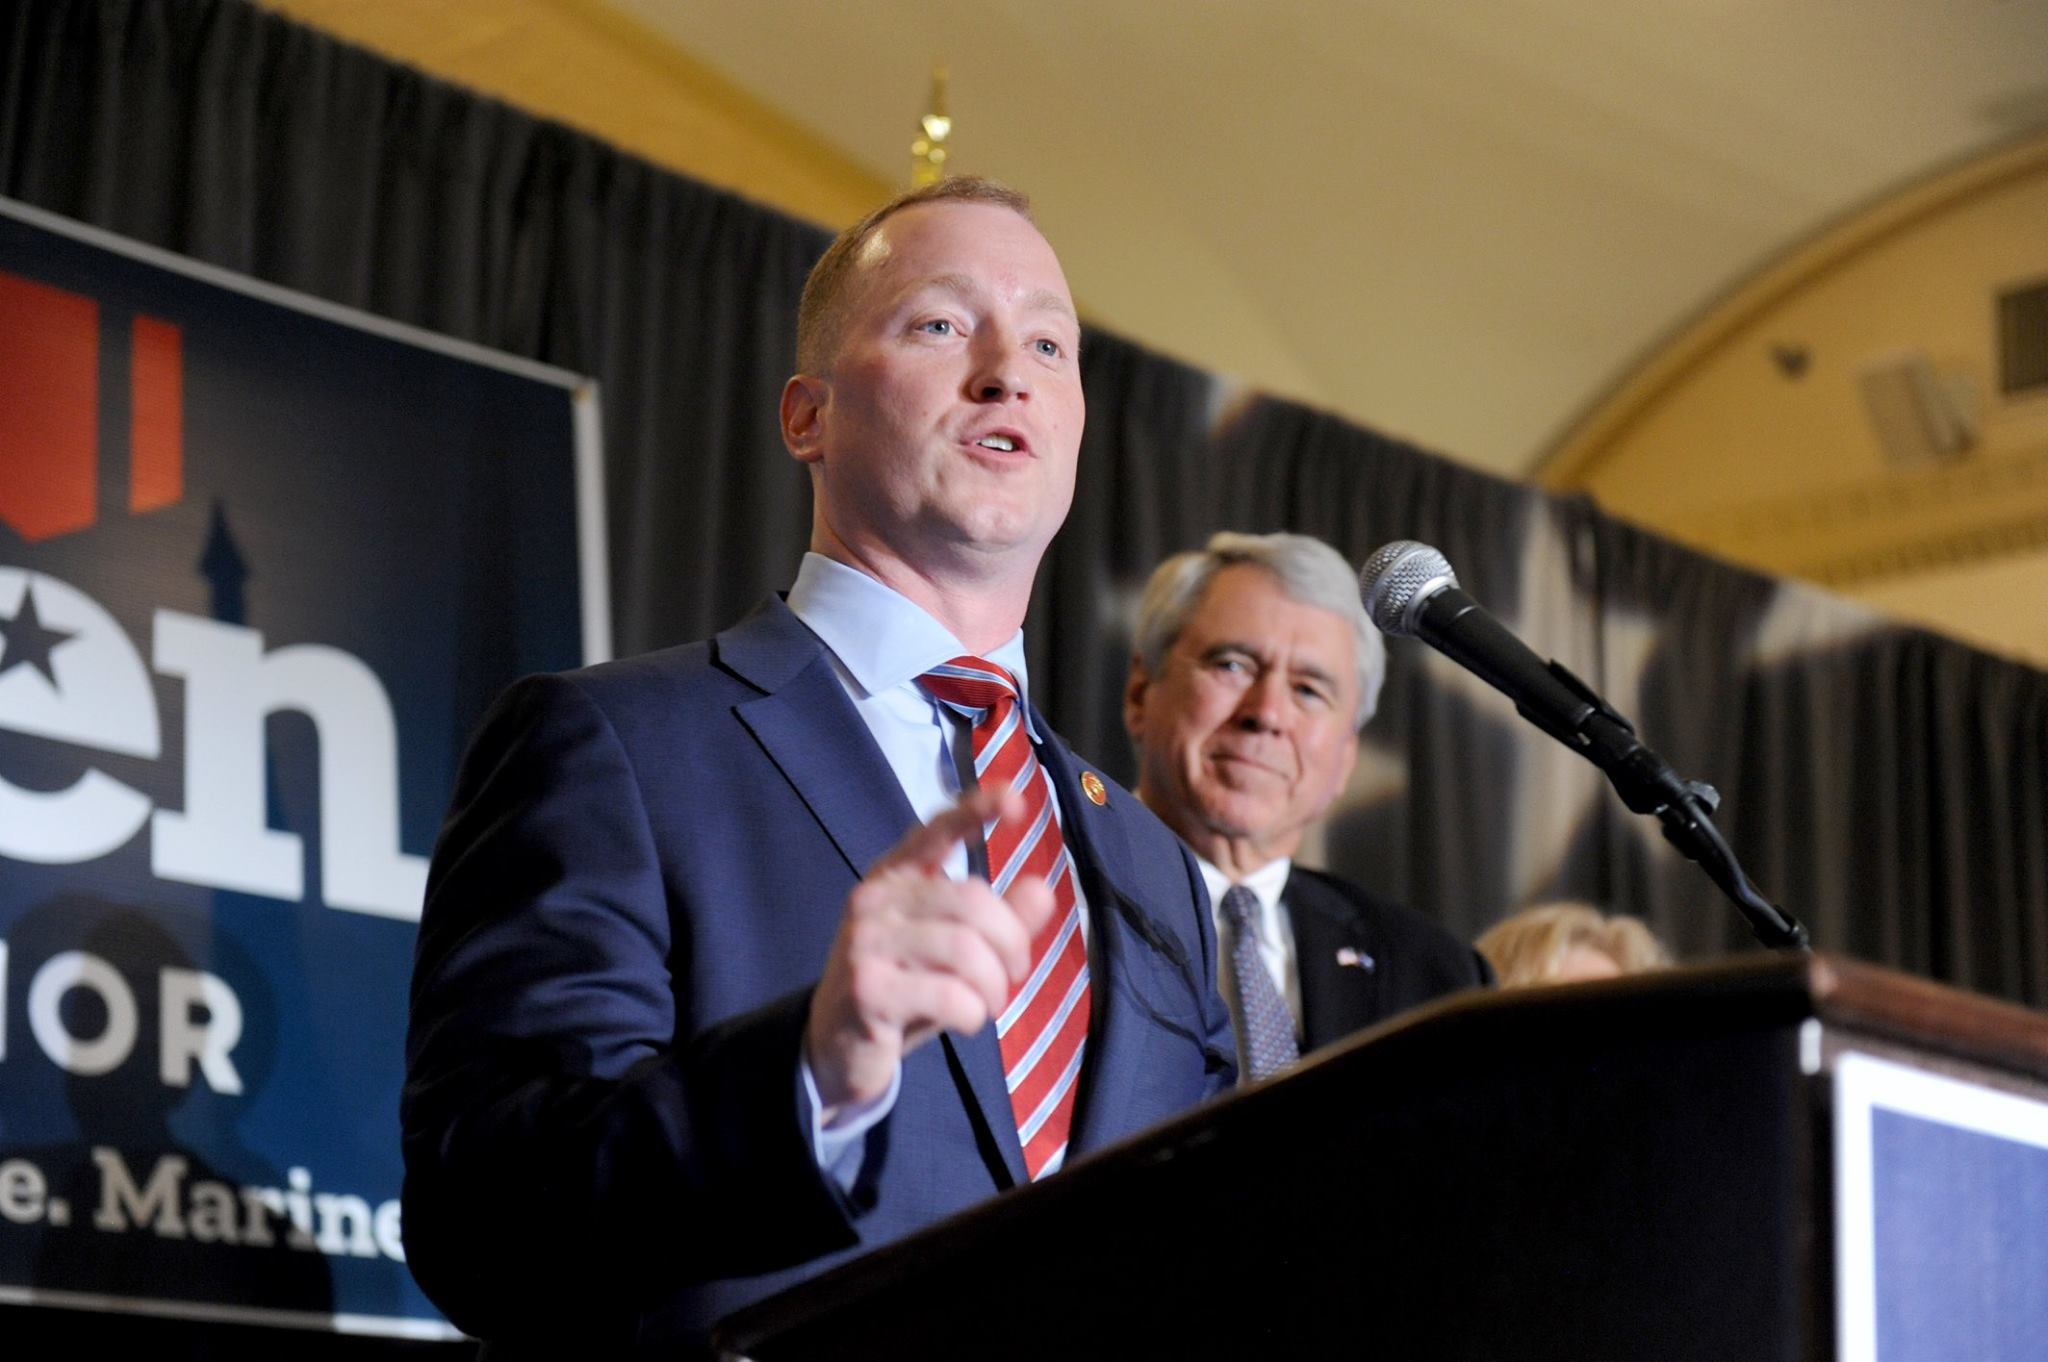 FITSNews – 2022 Kickstart? South Carolina's John Warren Launches New Pro-Taxpayer Initiative